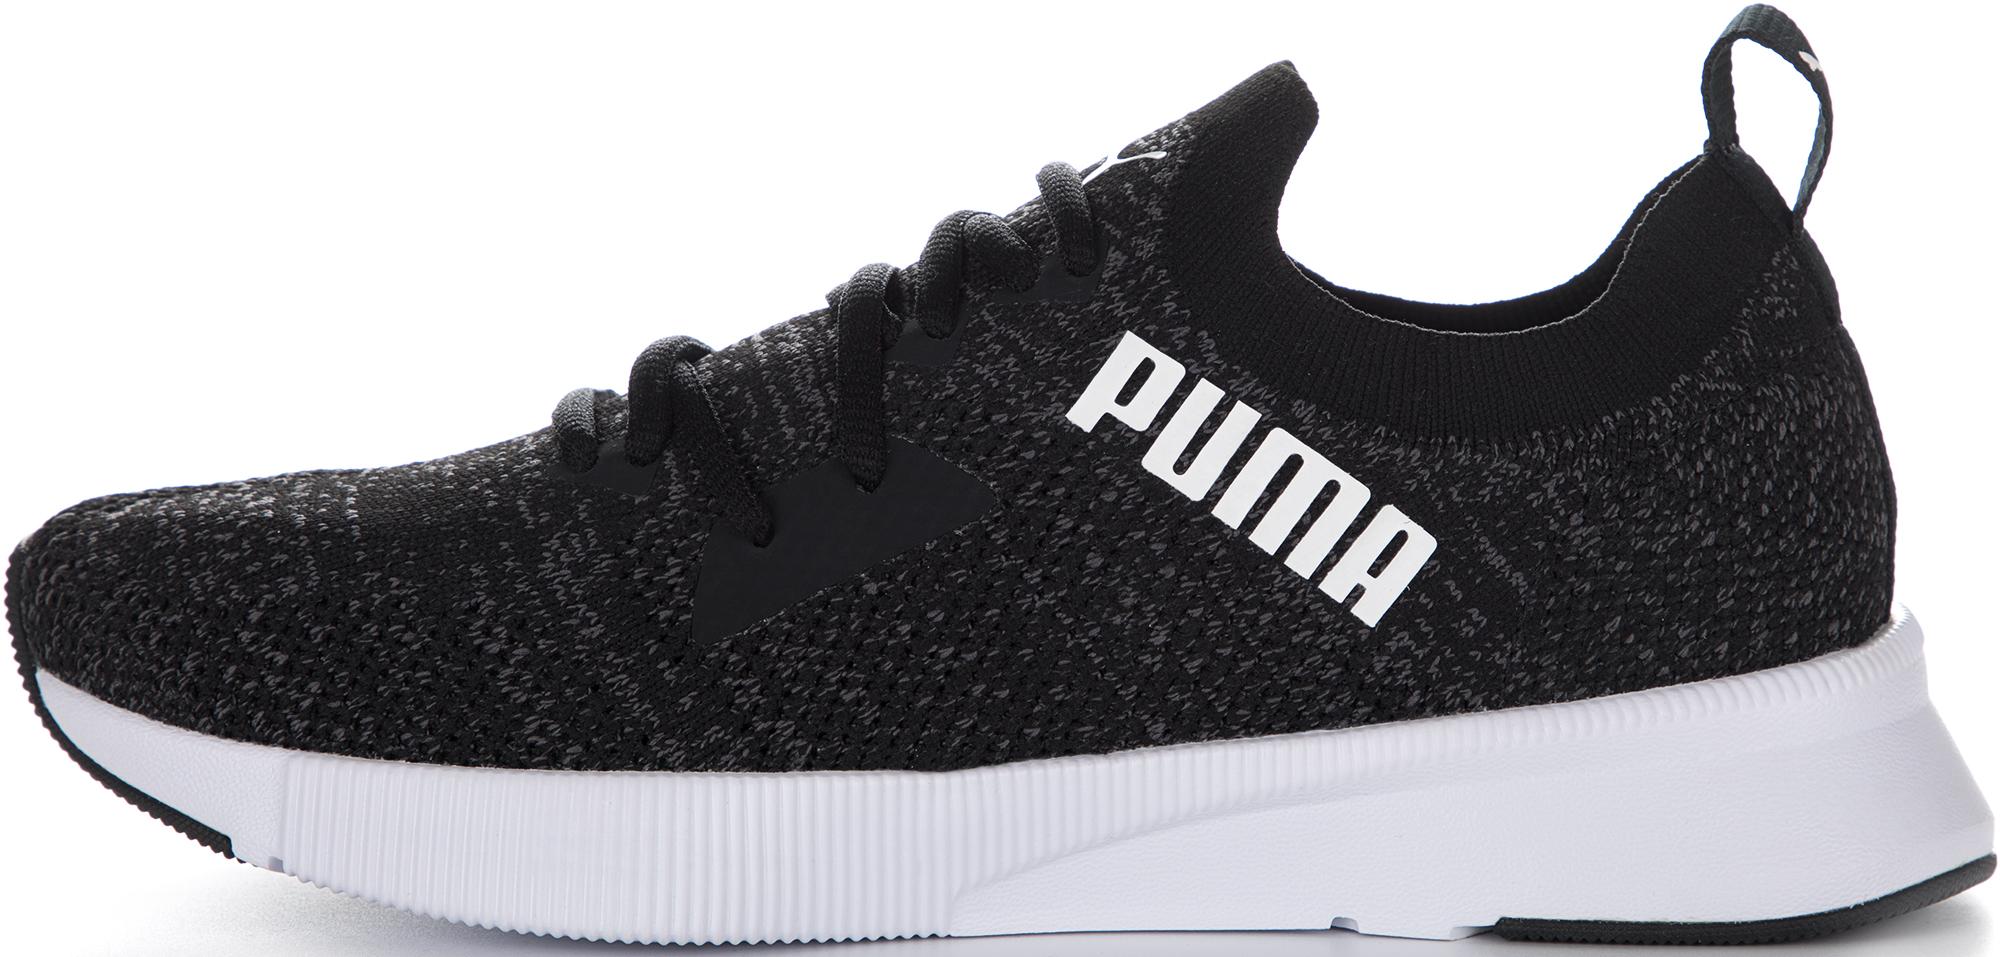 Puma Кроссовки женские Puma Flyer Runner Engineer, размер 40 все цены